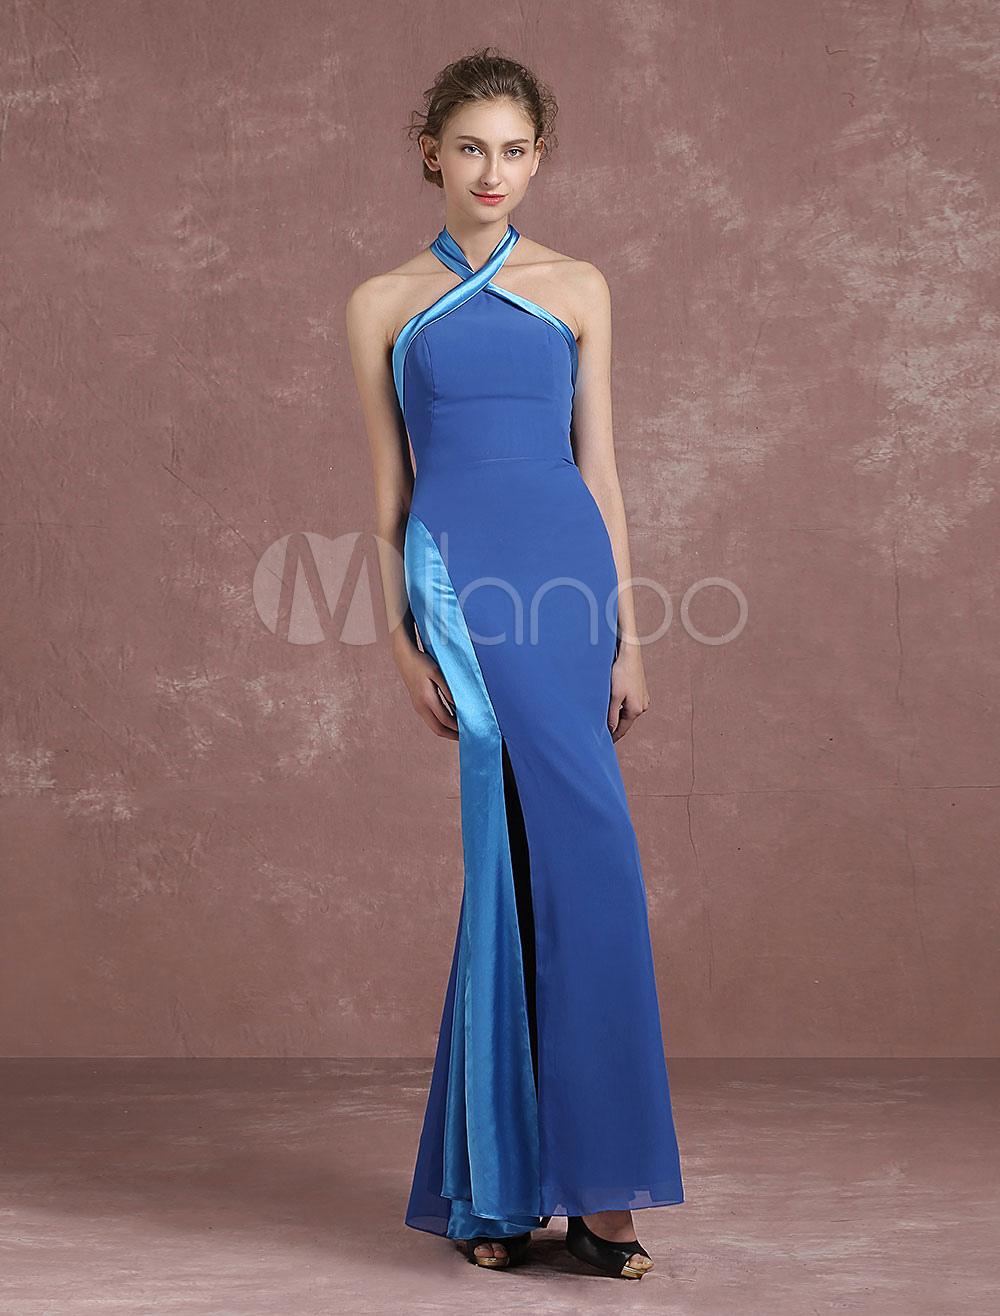 Halter Evening Dress Mermaid High Split Party Dress Bowknot Royal Blue Color Block Ankle Length Formal Dress (Wedding Evening Dresses) photo